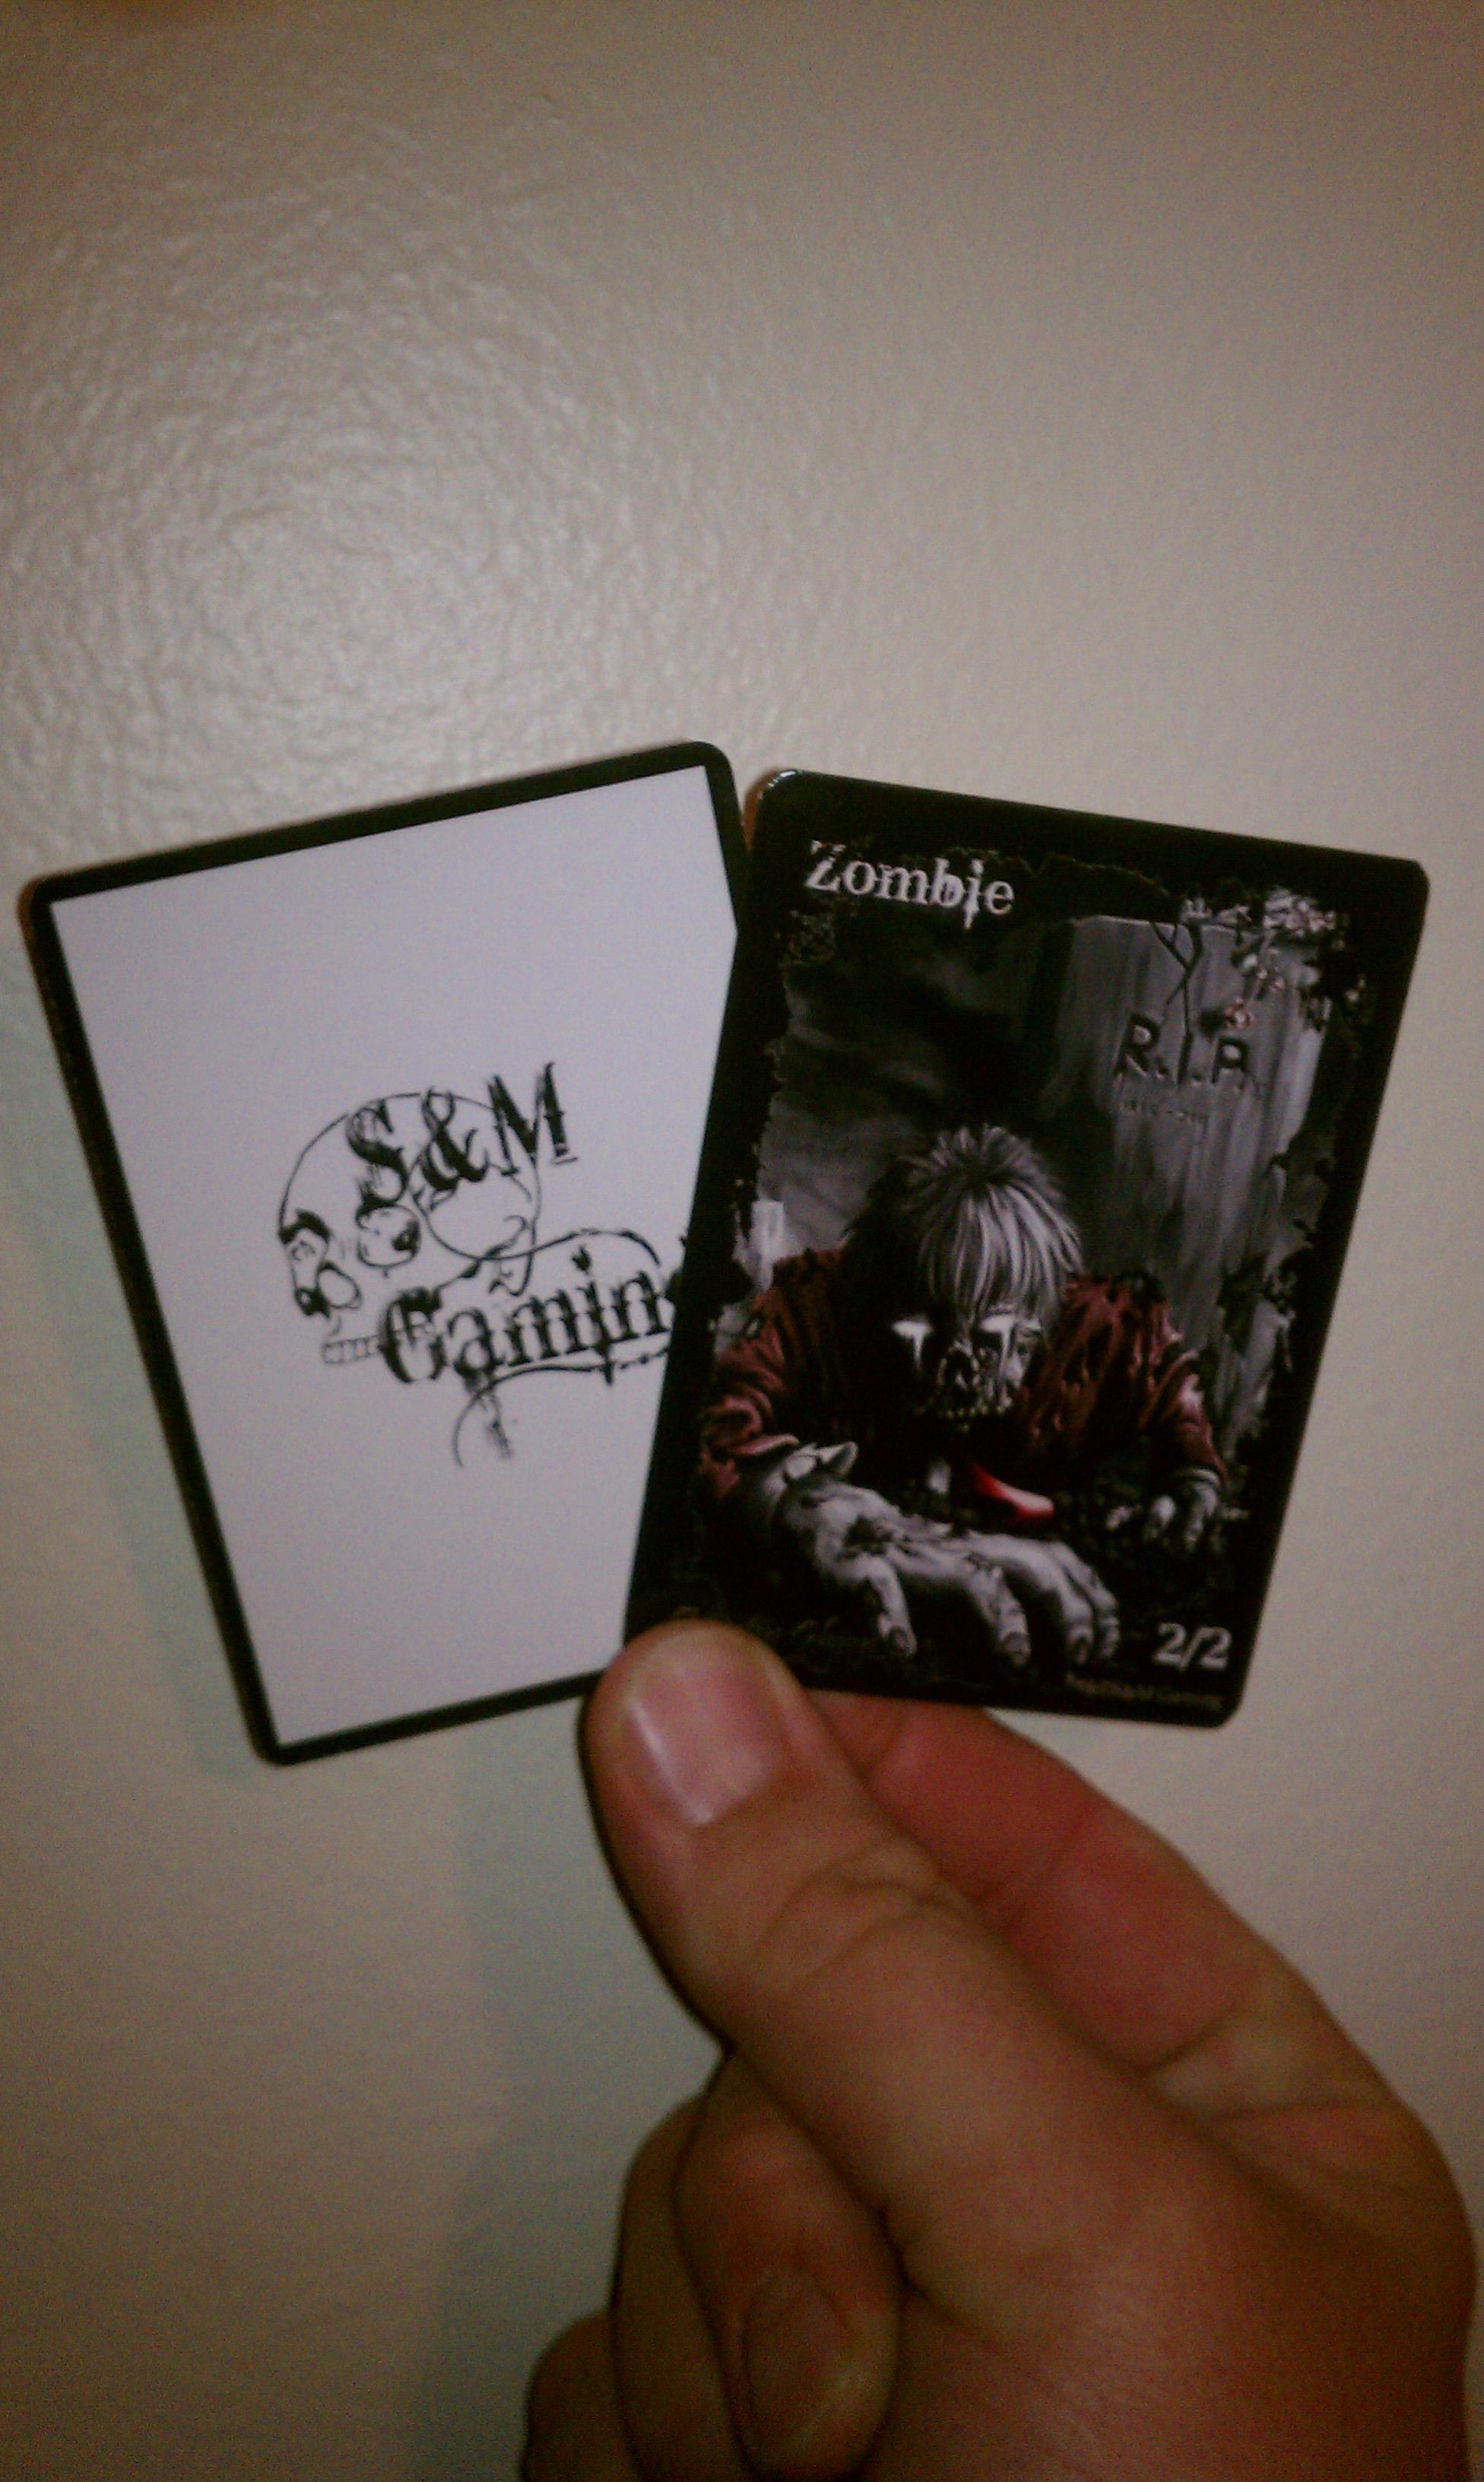 Zombie Token 01 Final Print by SandM-Gaming